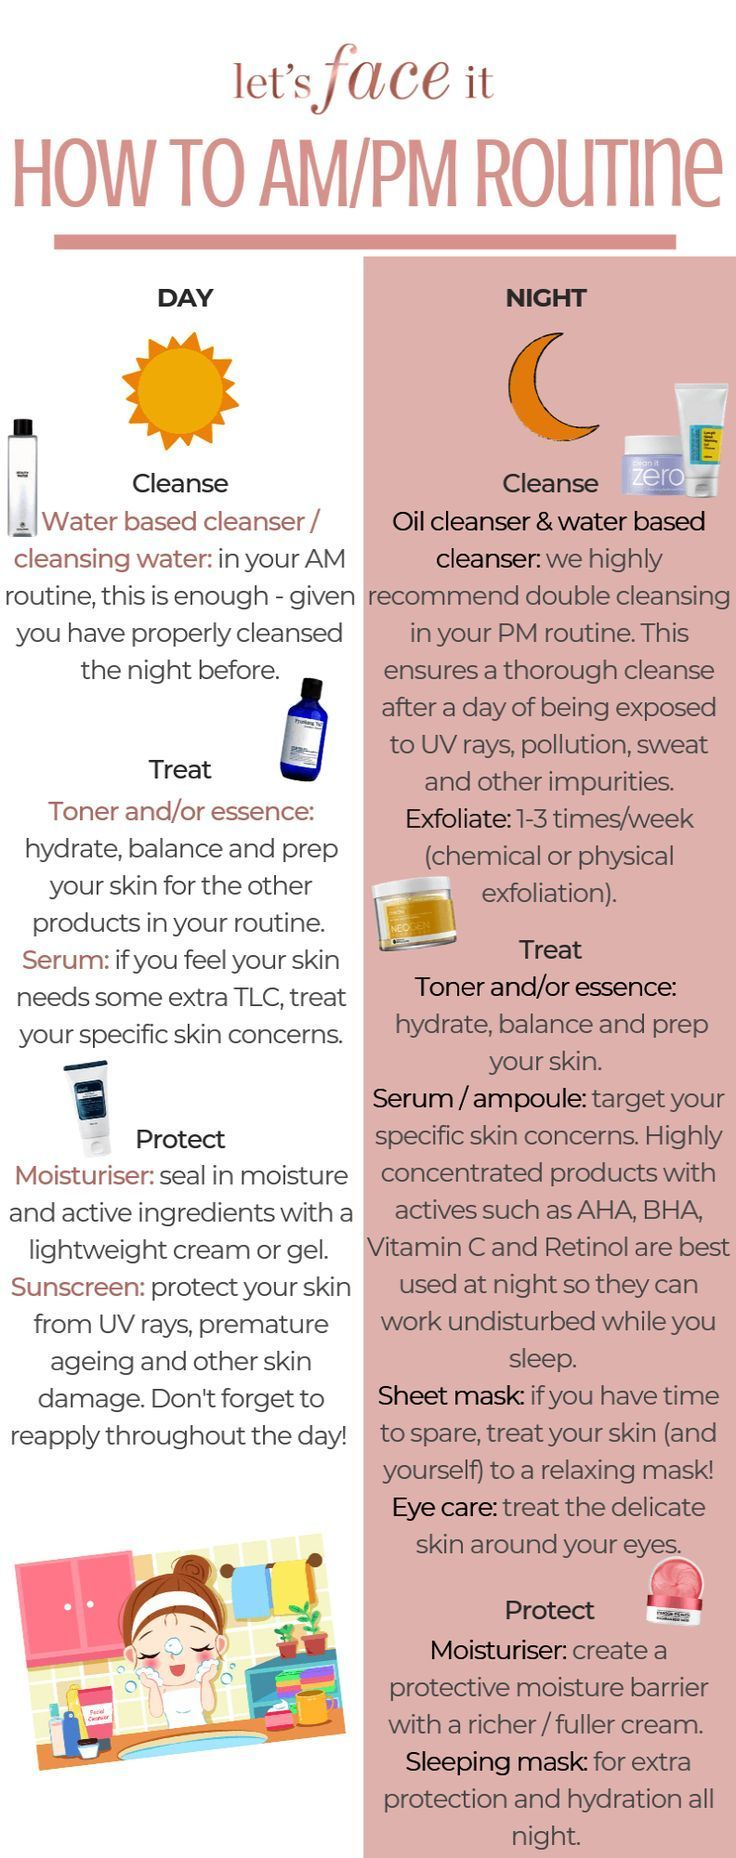 Explaining The Korean 10 Step Skincare Routine A M To P M Printable Facial Skin Care Routine Skin Care Routine Steps Skin Care Routine